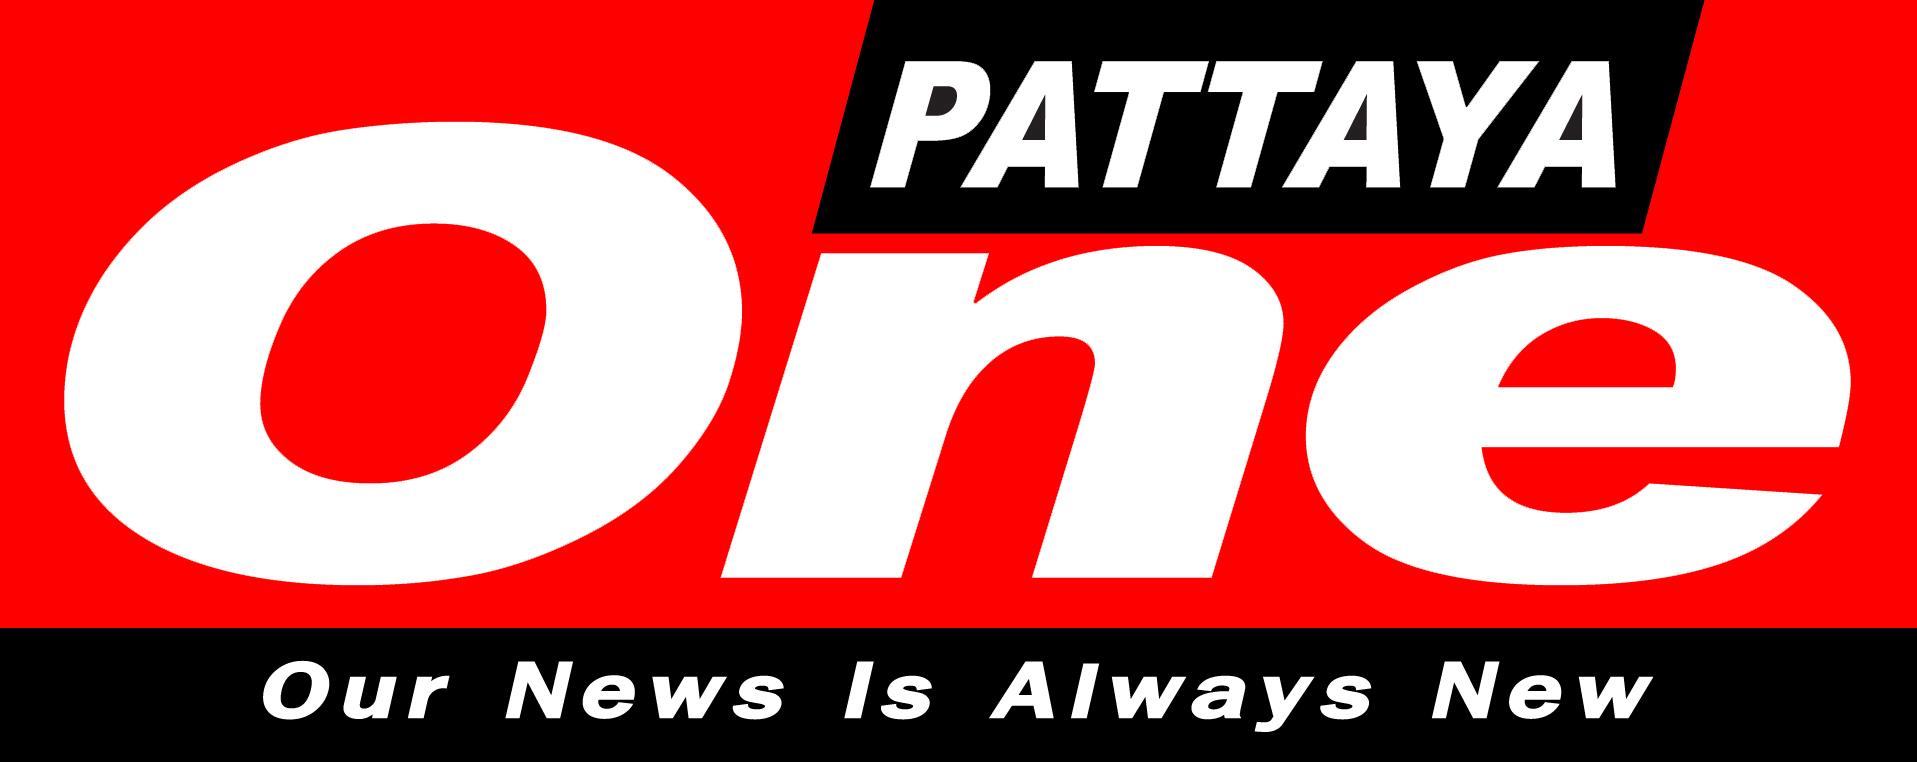 Pattaya One News